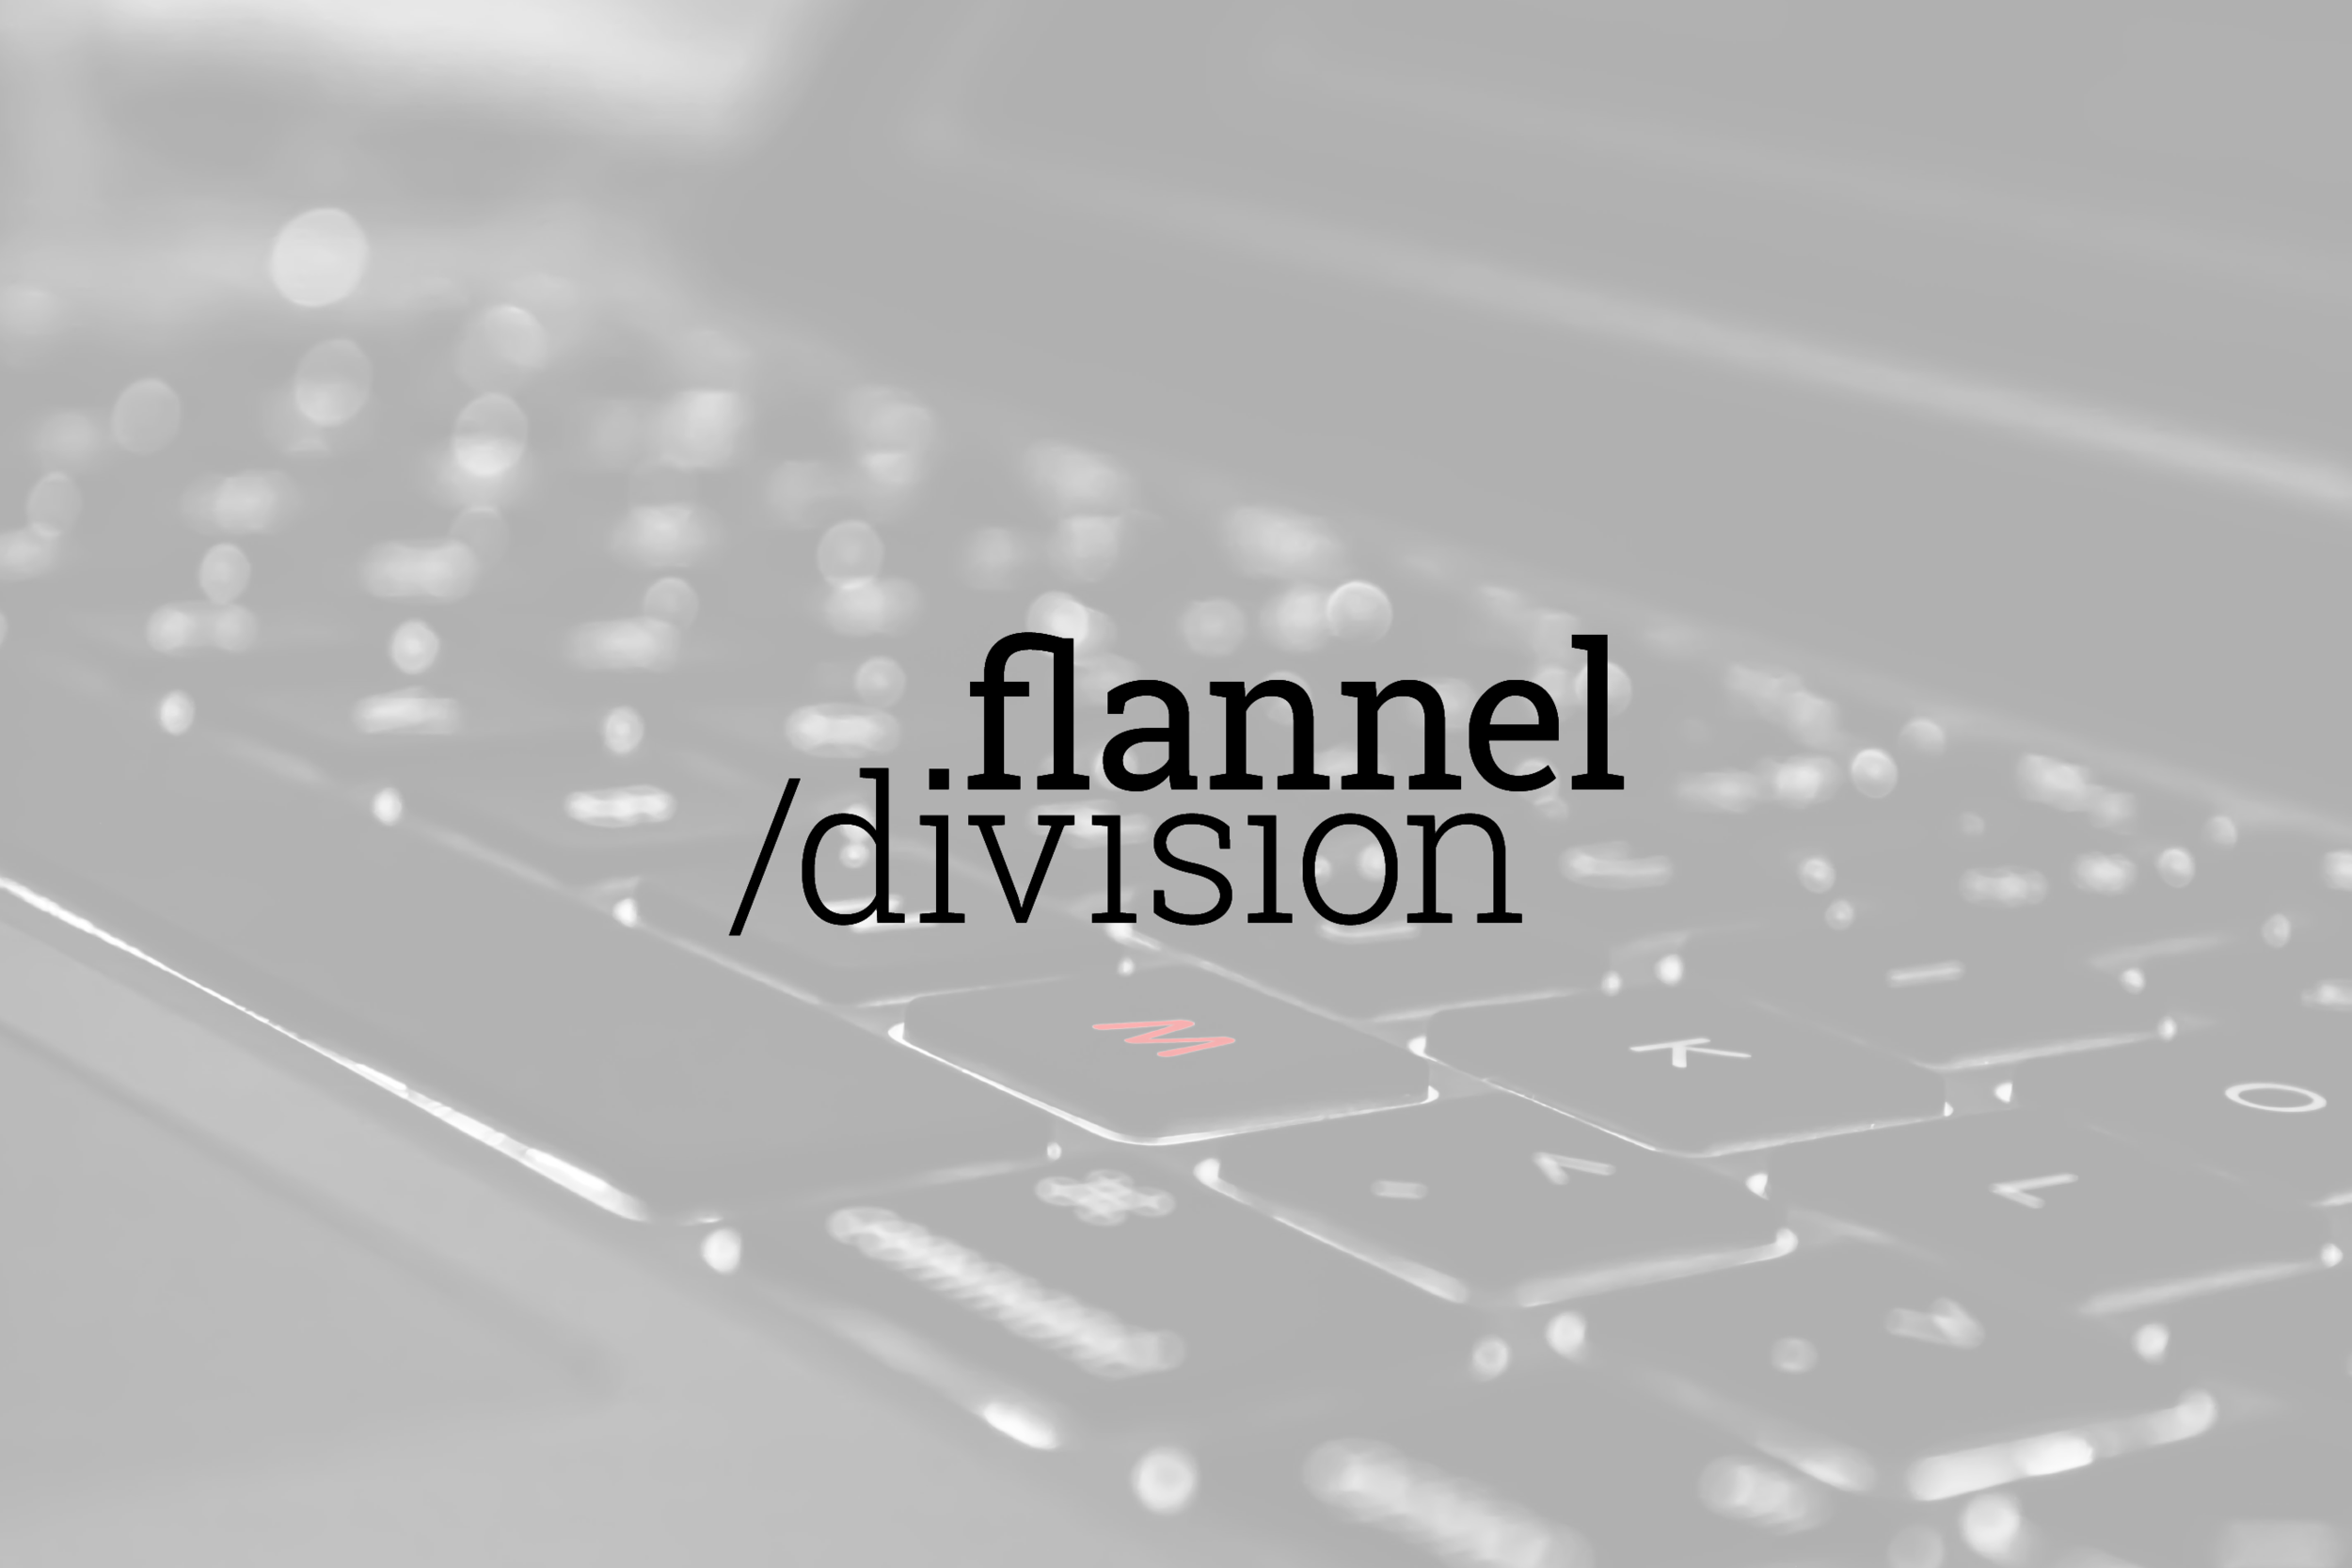 Logo design for Flannel Division, tech company in Austin, Texas.